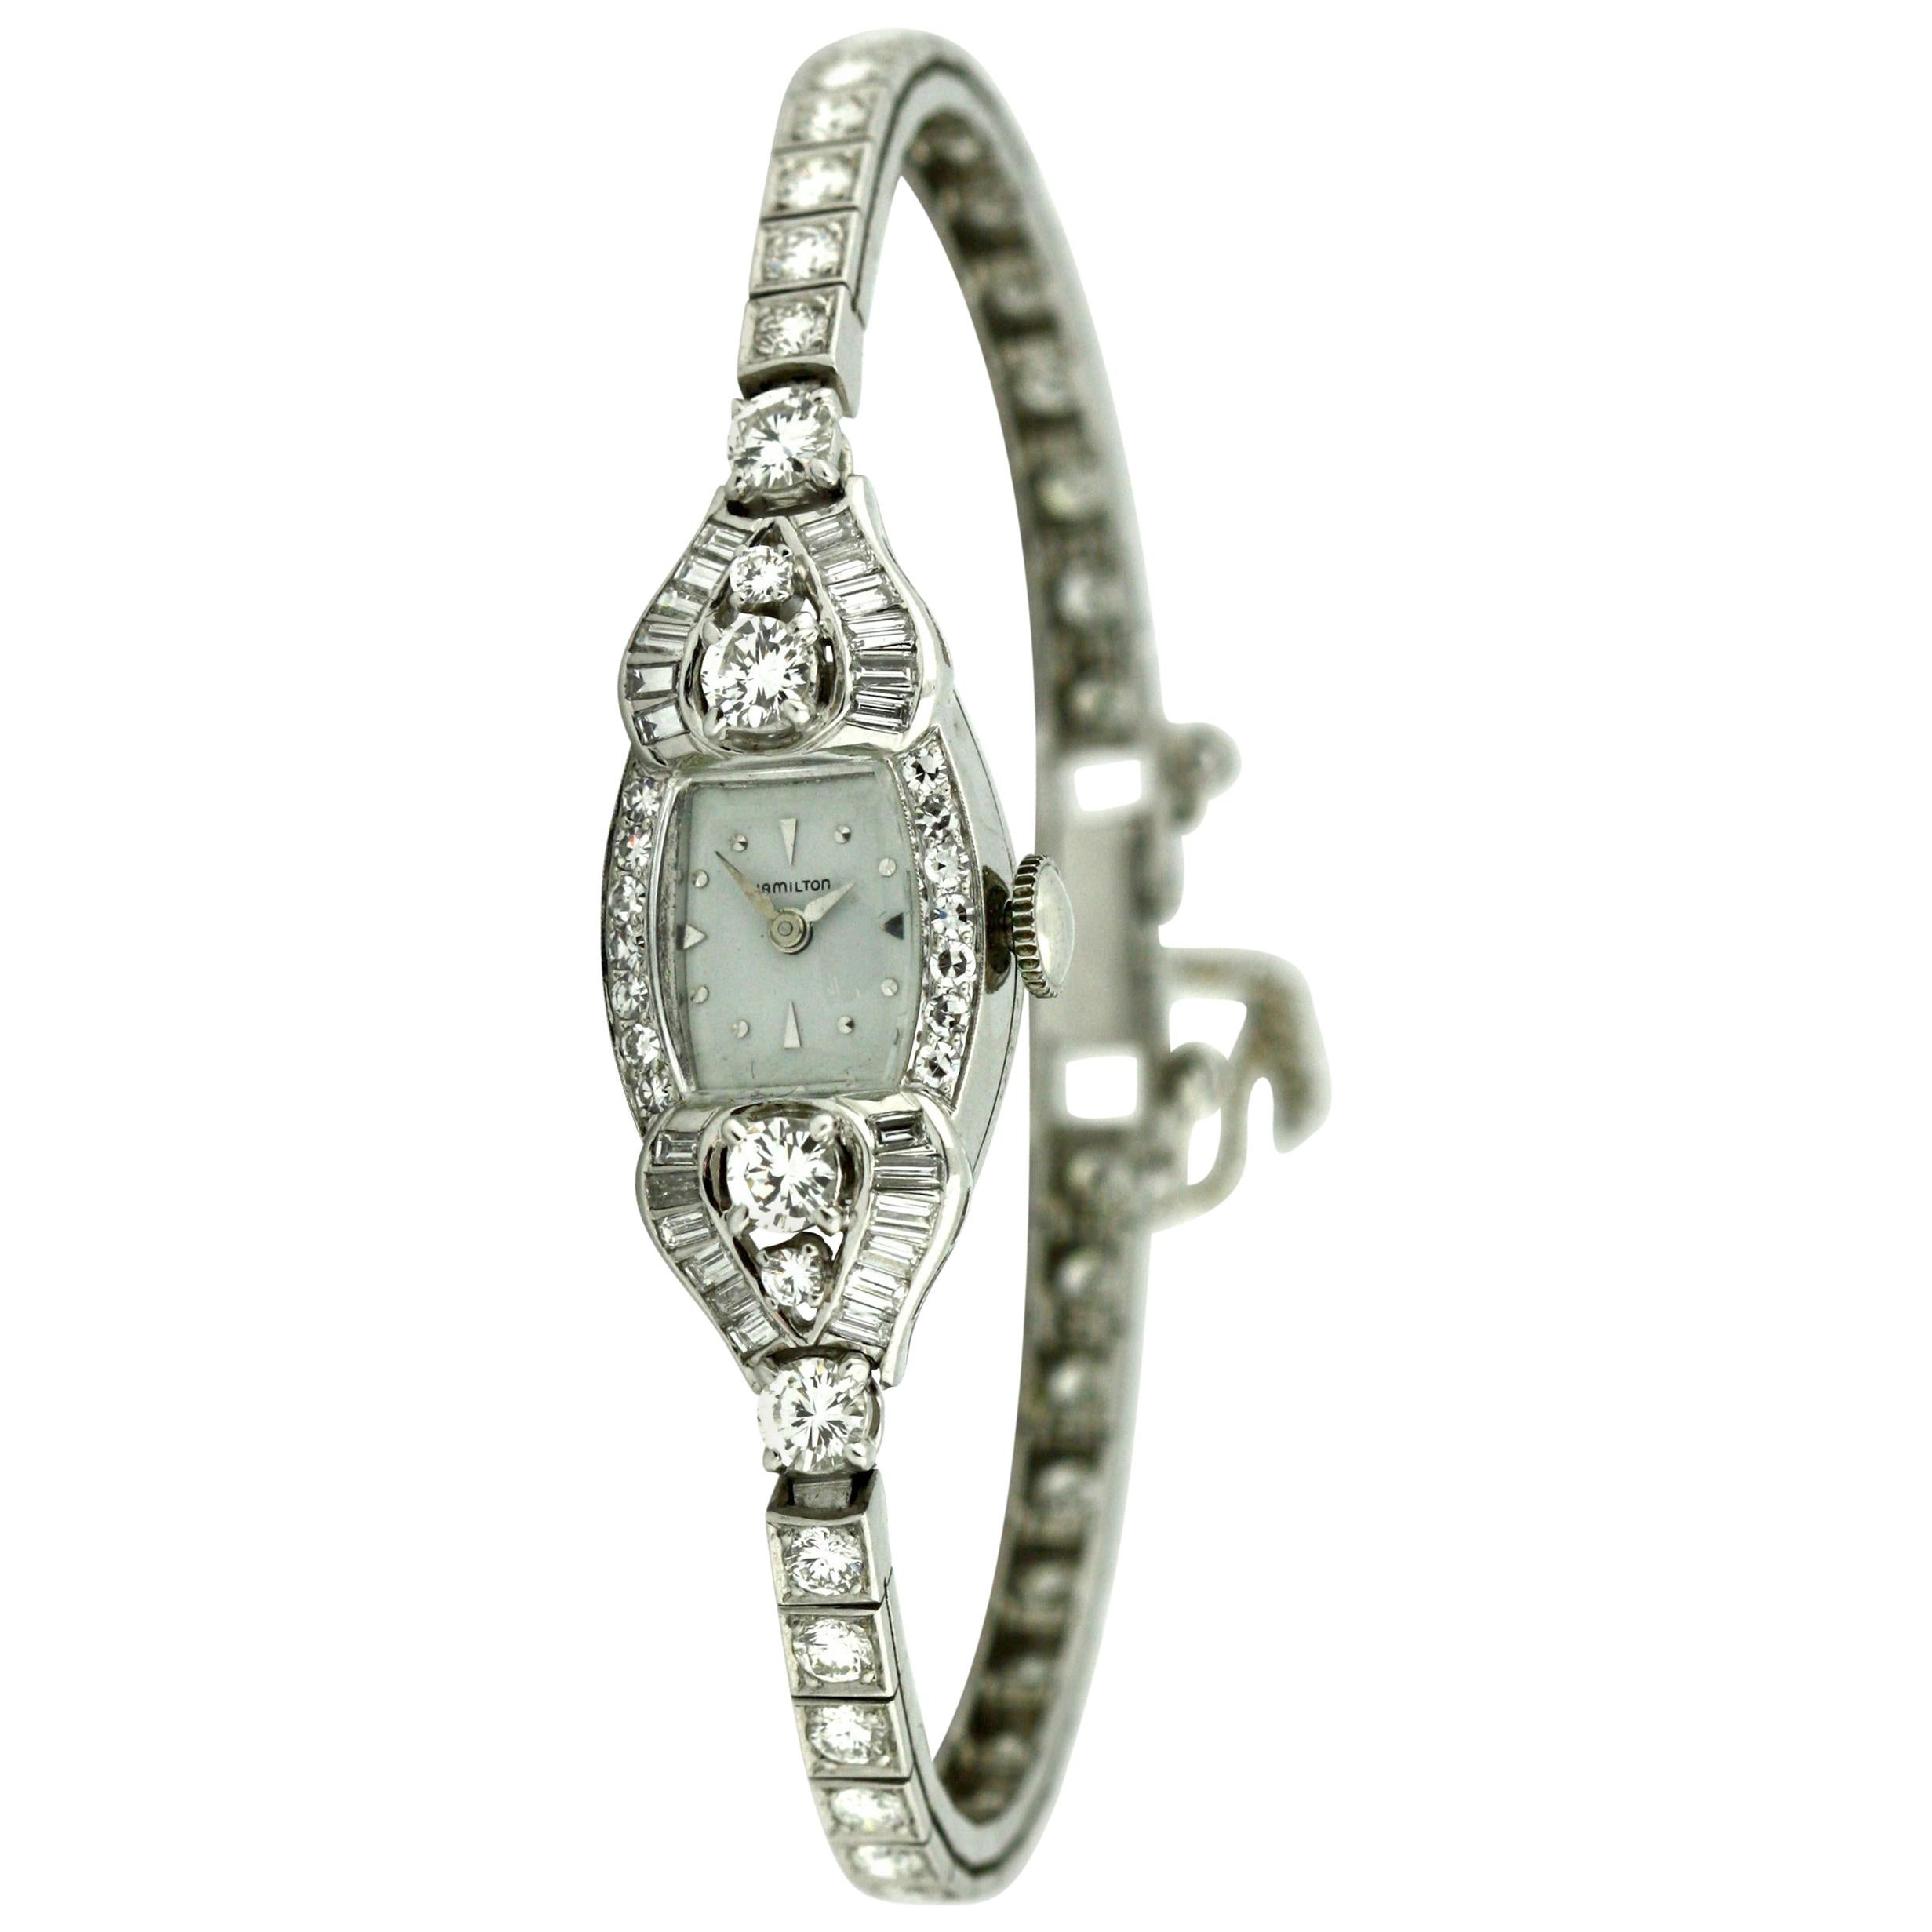 Platinum and Diamond Bracelet Watch Hamilton